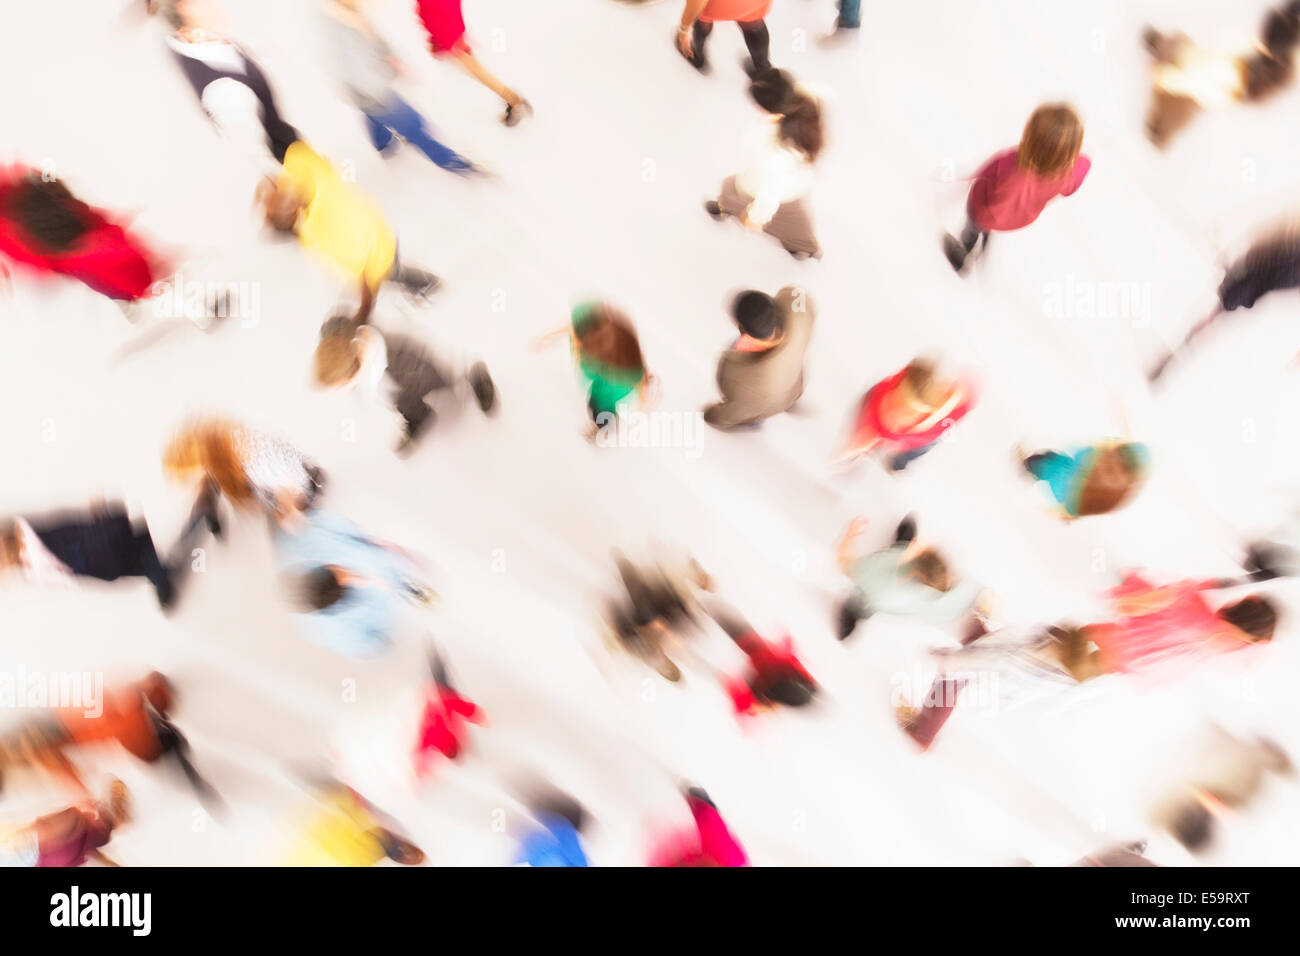 Geschäftsleute in Bewegung Stockbild